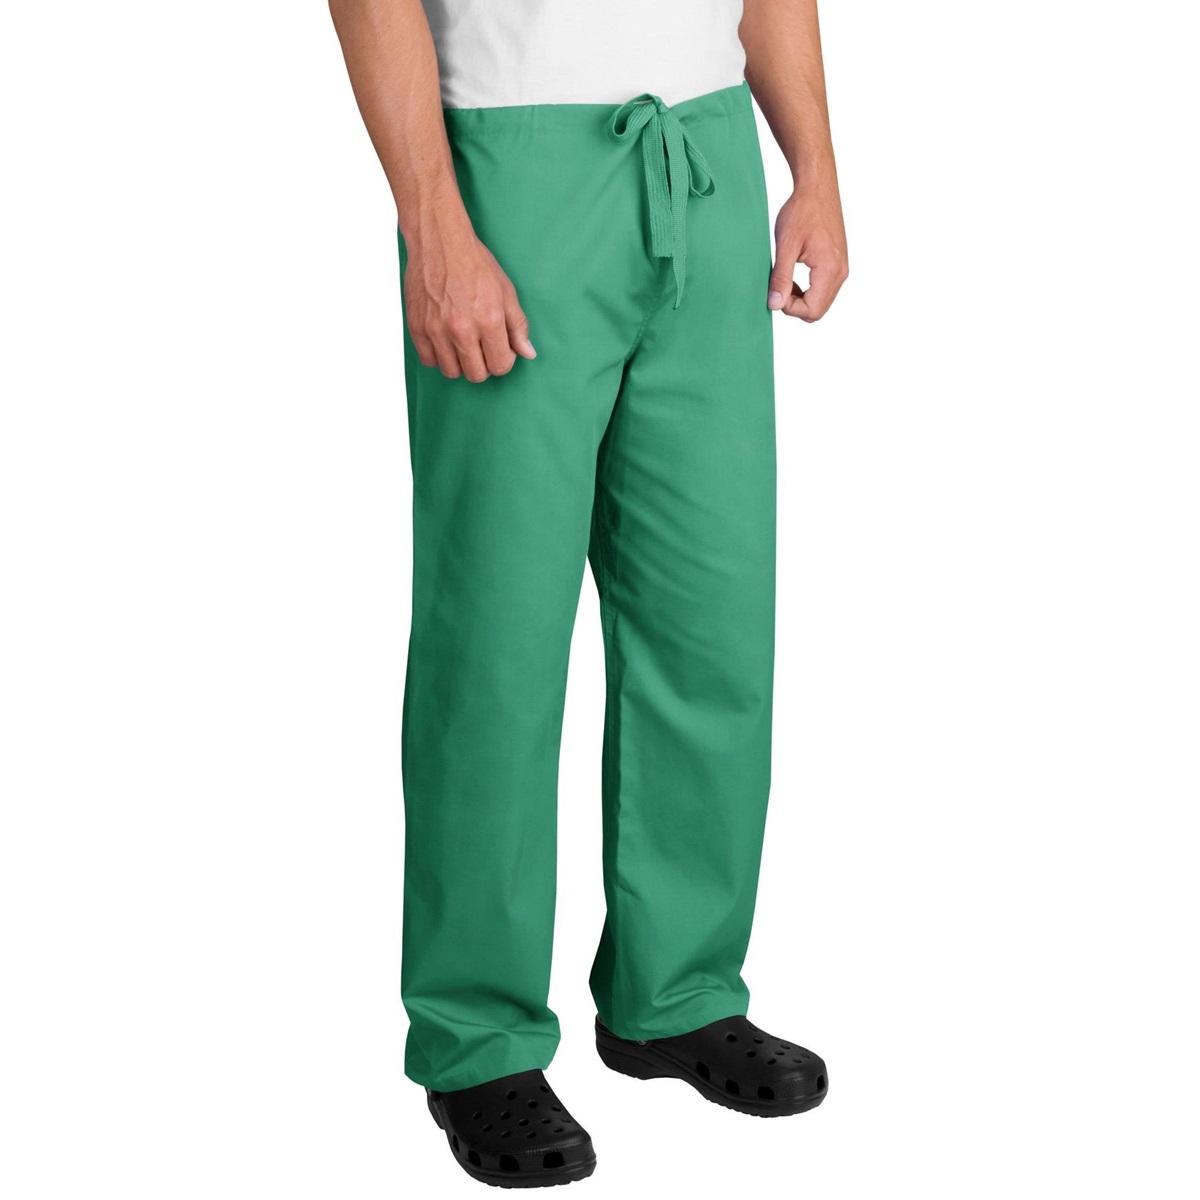 CornerStone CS502 Reversible Scrub Pants - Jade Green   FullSource.com